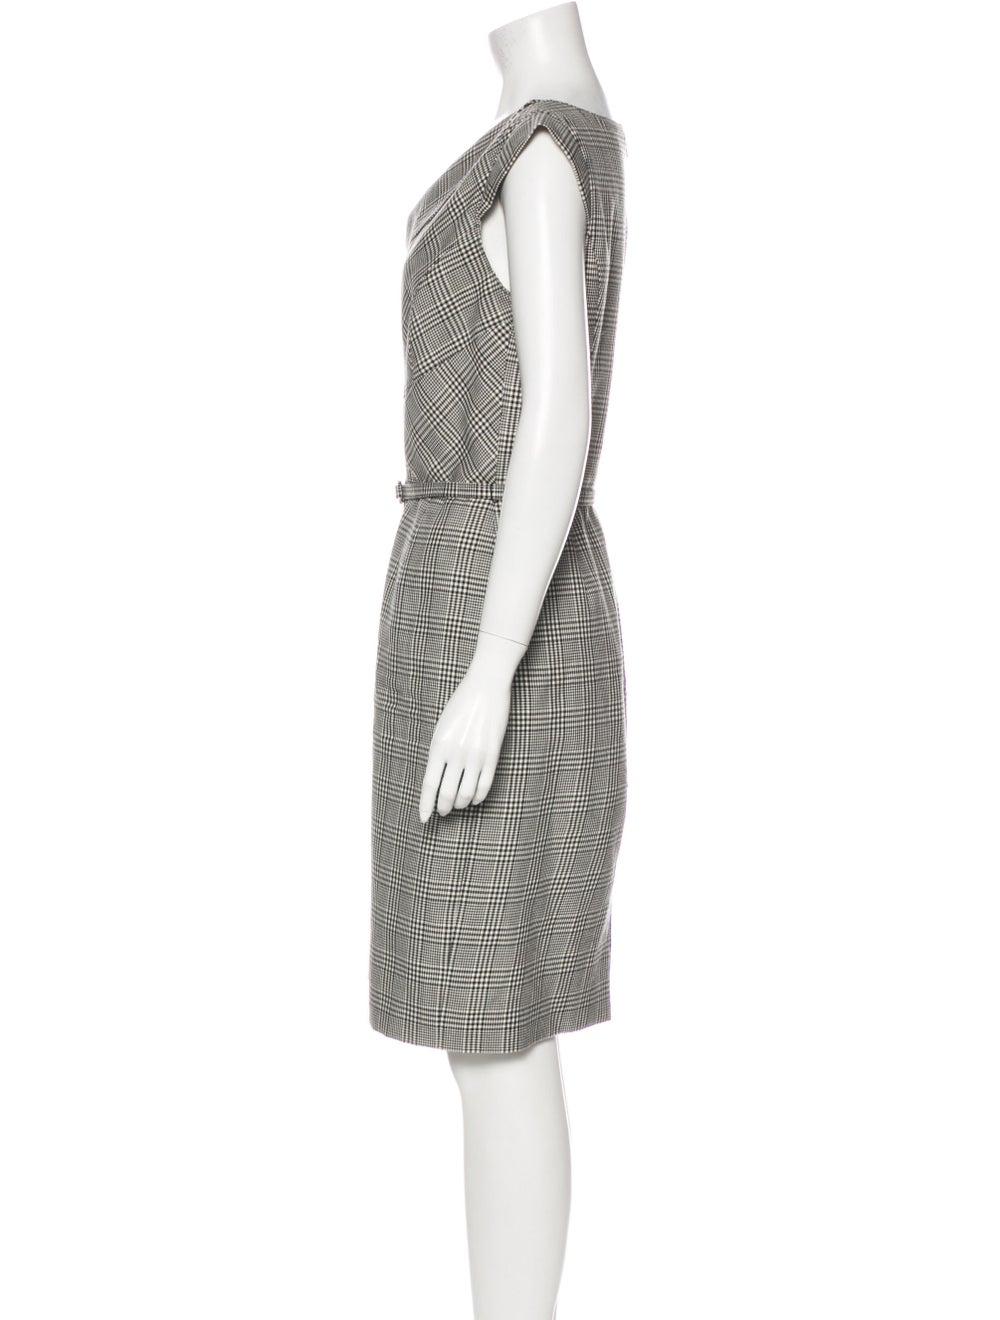 Oscar de la Renta 2013 Knee-Length Dress - image 2